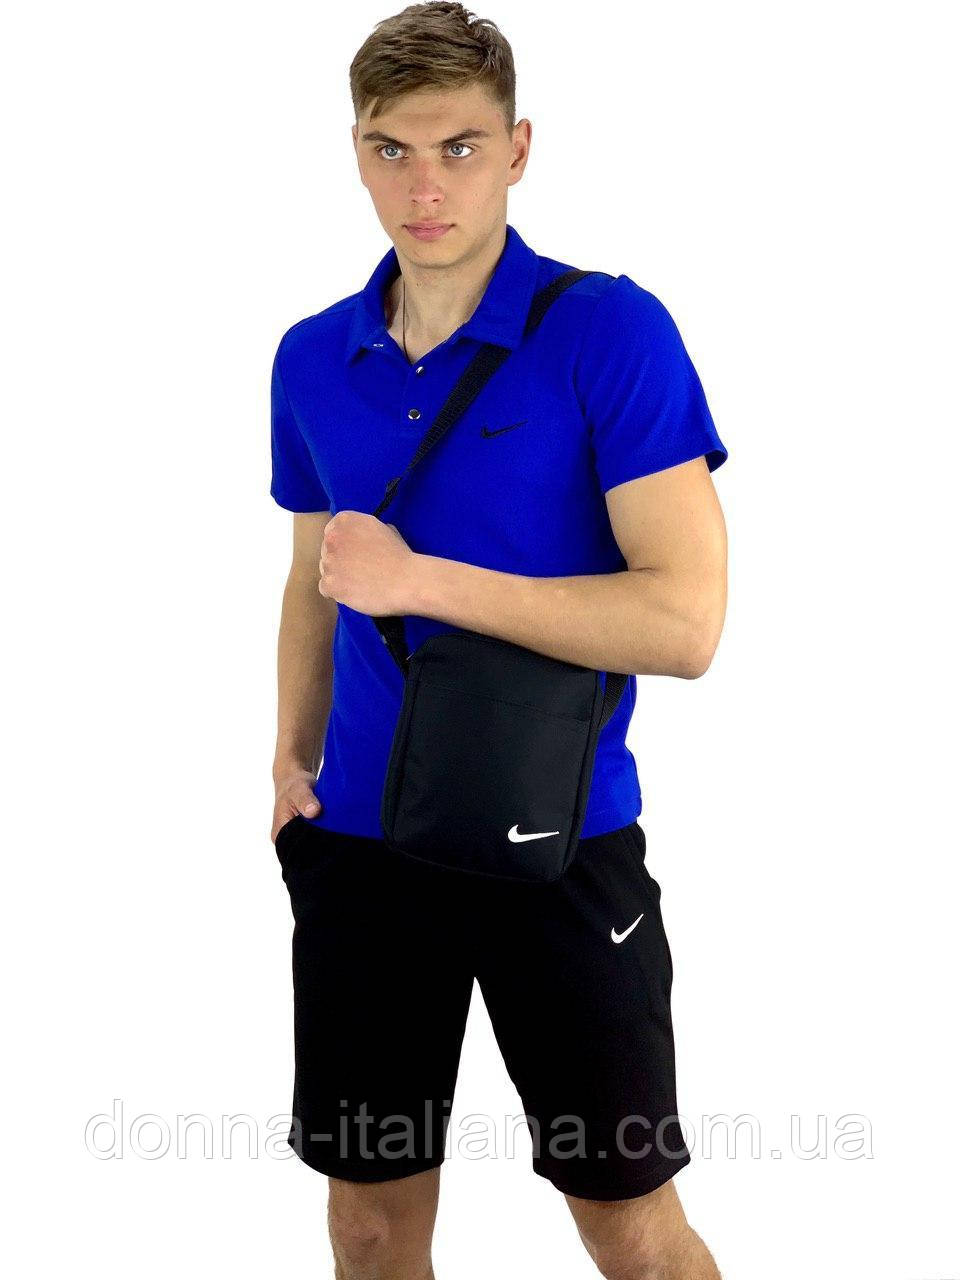 Комплект Футболка Polo+ Шорти+ Барсетка Nike Репліка L Електрик з чорним (KomNikeElectrician1/3)